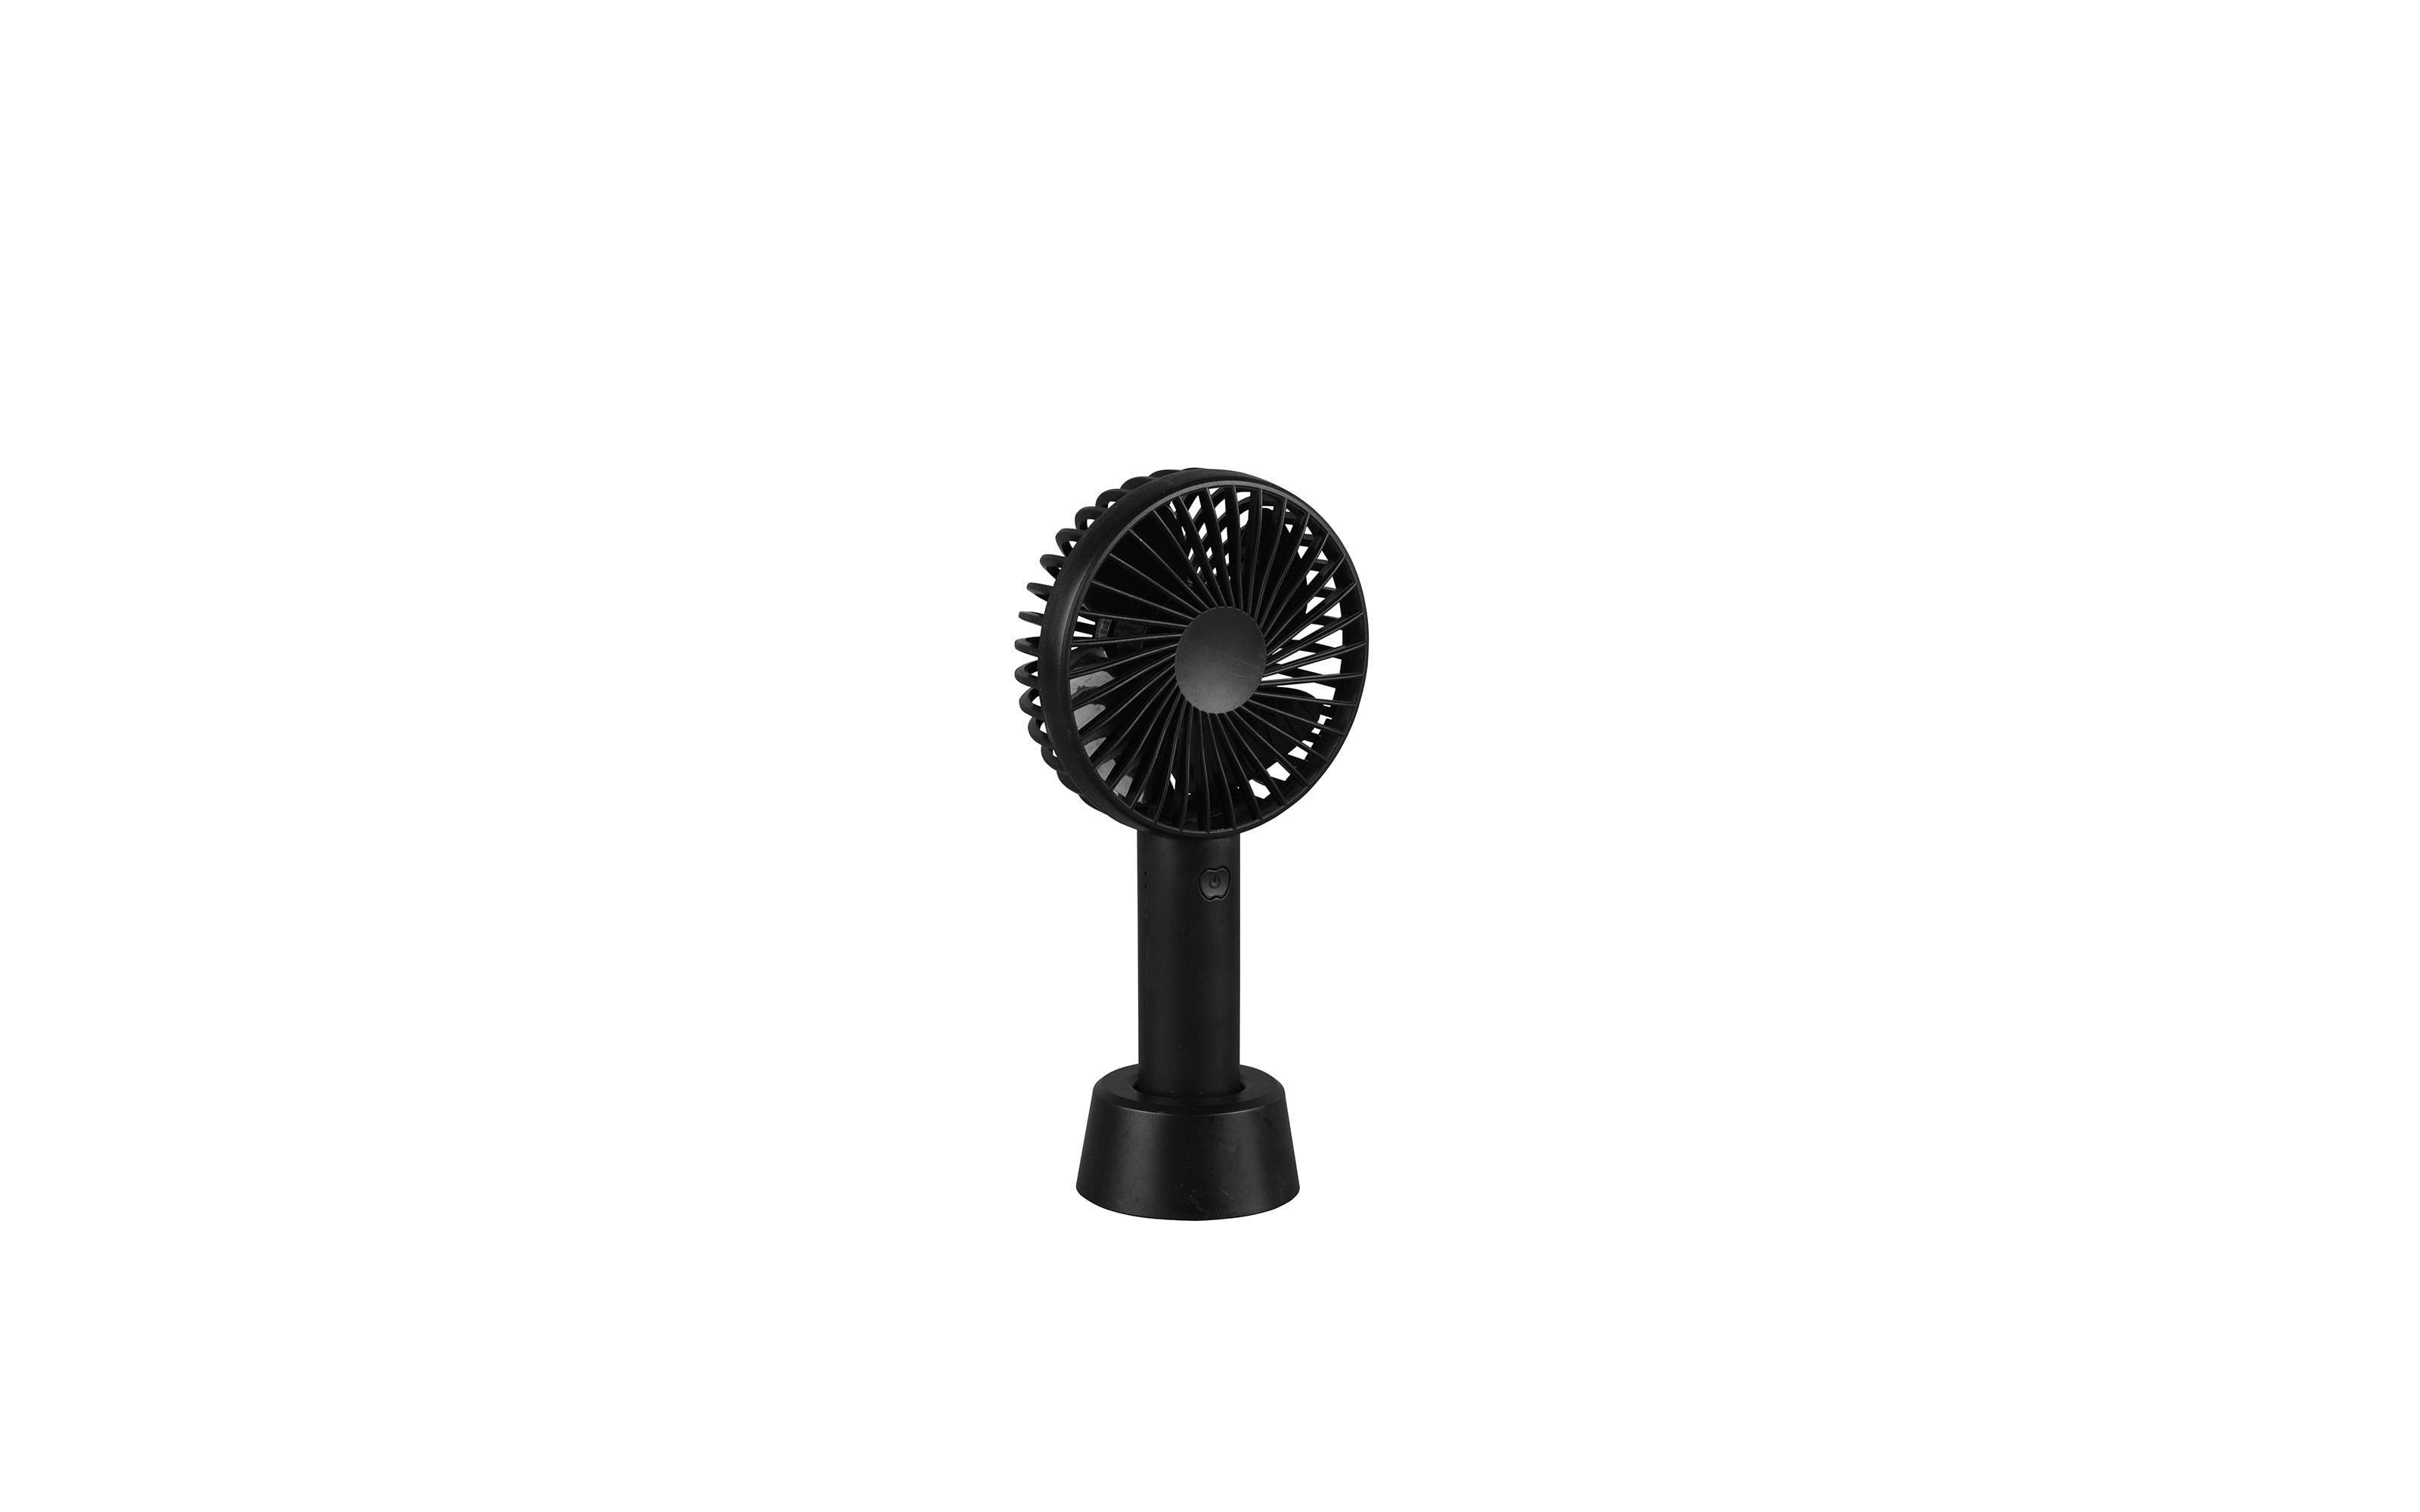 Handventilator Togo in schwarz, 21 cm